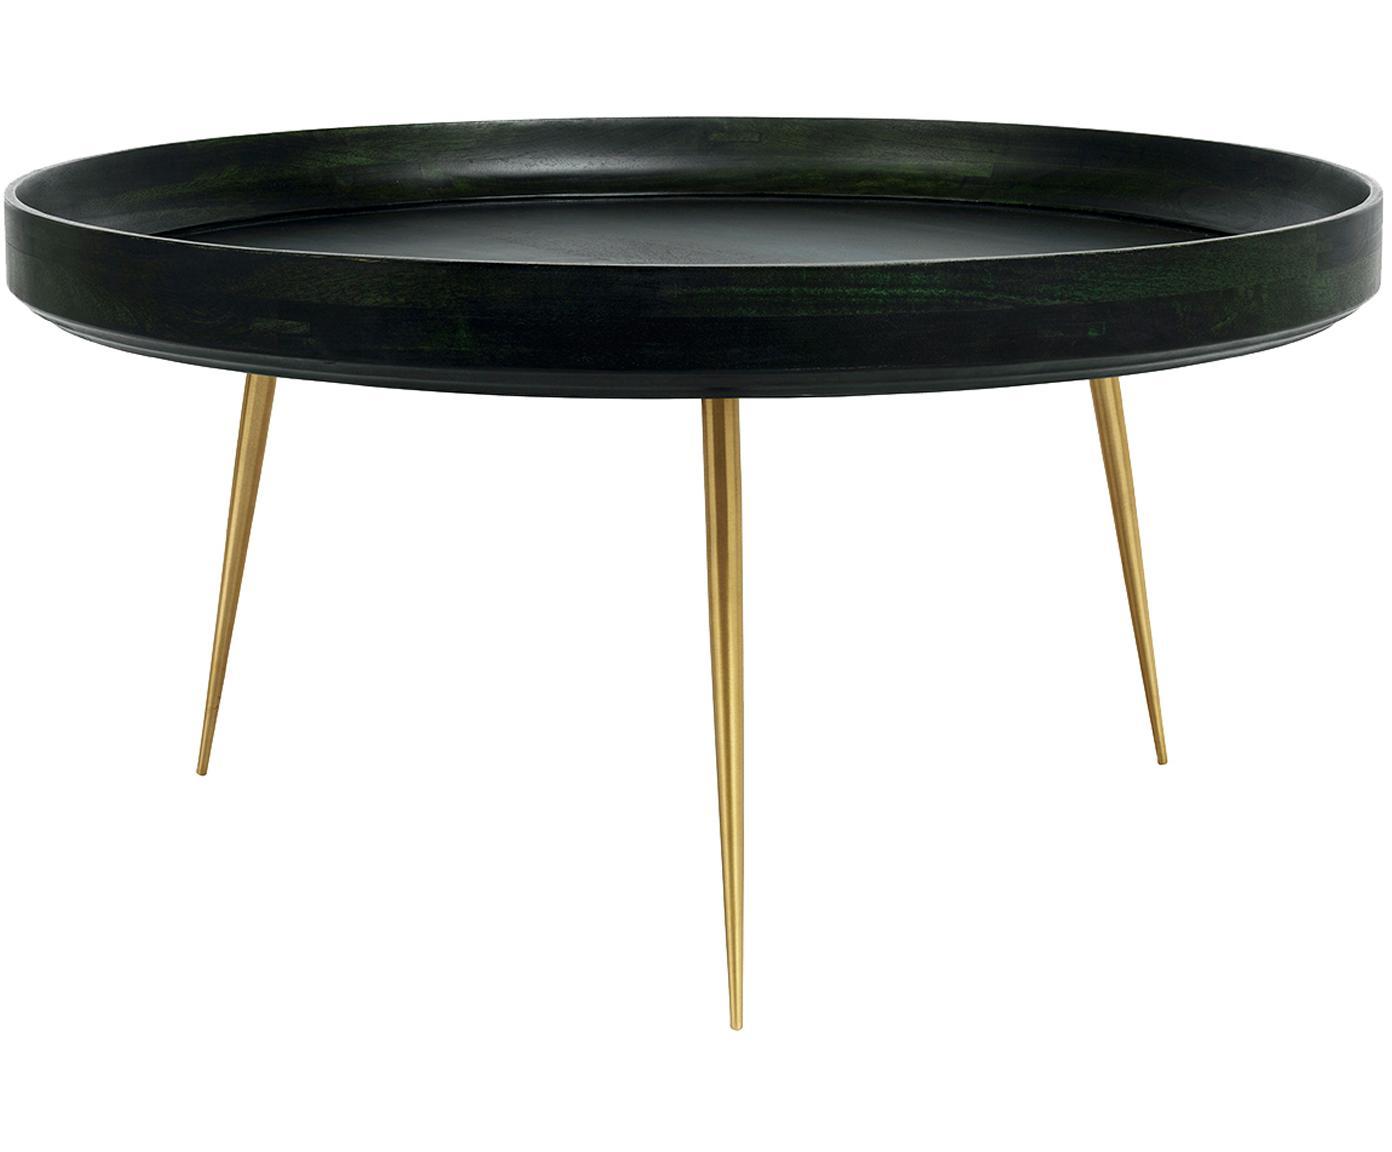 Design salontafel Bowl Table van mangohout, Tafelblad: mangohout, bekleed met lo, Poten: vermessingd metaal, Nori groen, messingkleurig, Ø 75 x H 38 cm